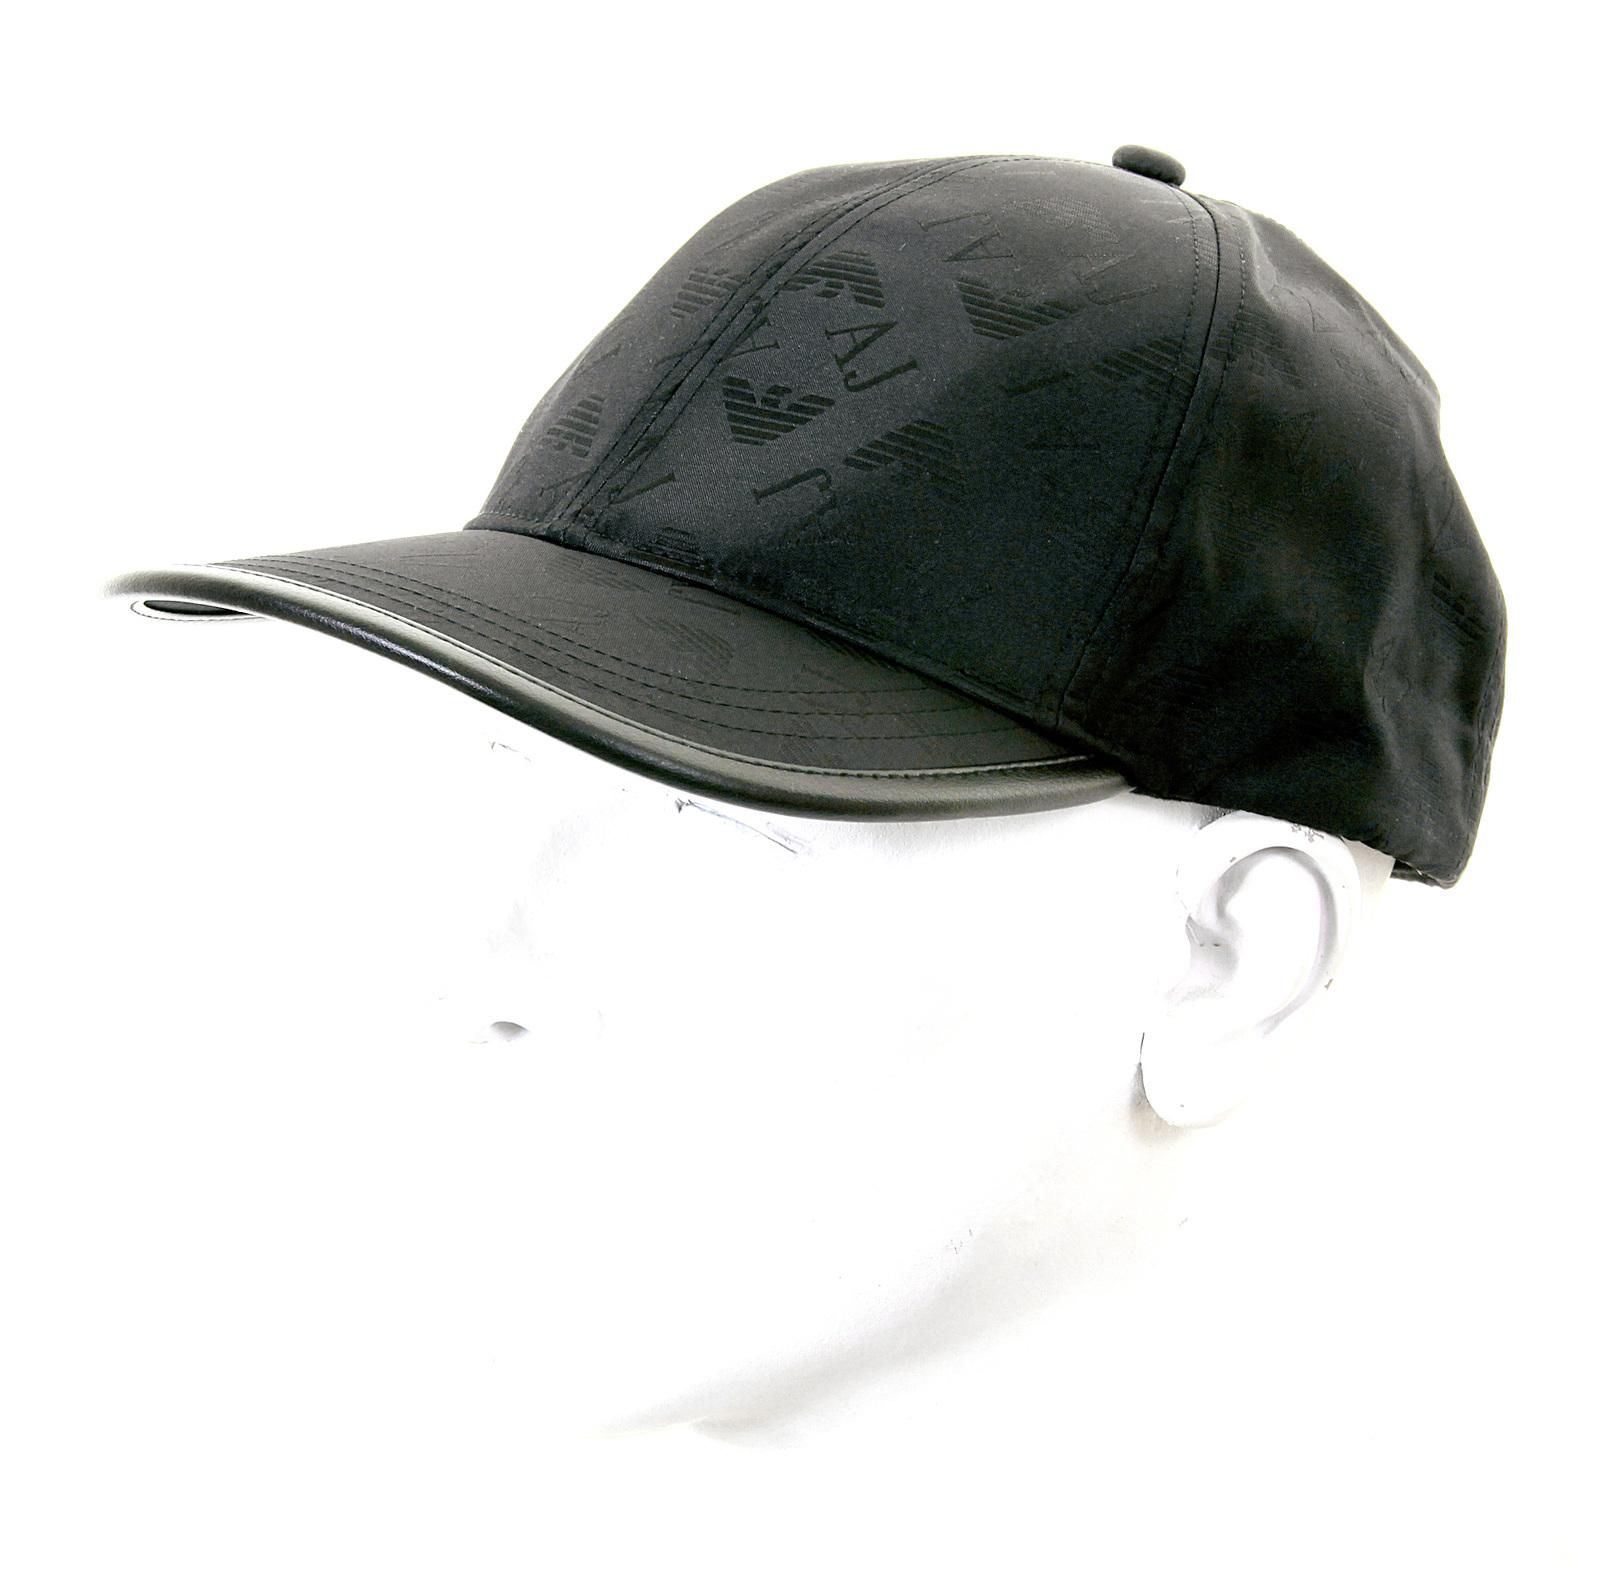 Armani Jeans black monogram baseball cap 06482 YS AJM1204 at Togged Clothing b3fa1ce99699